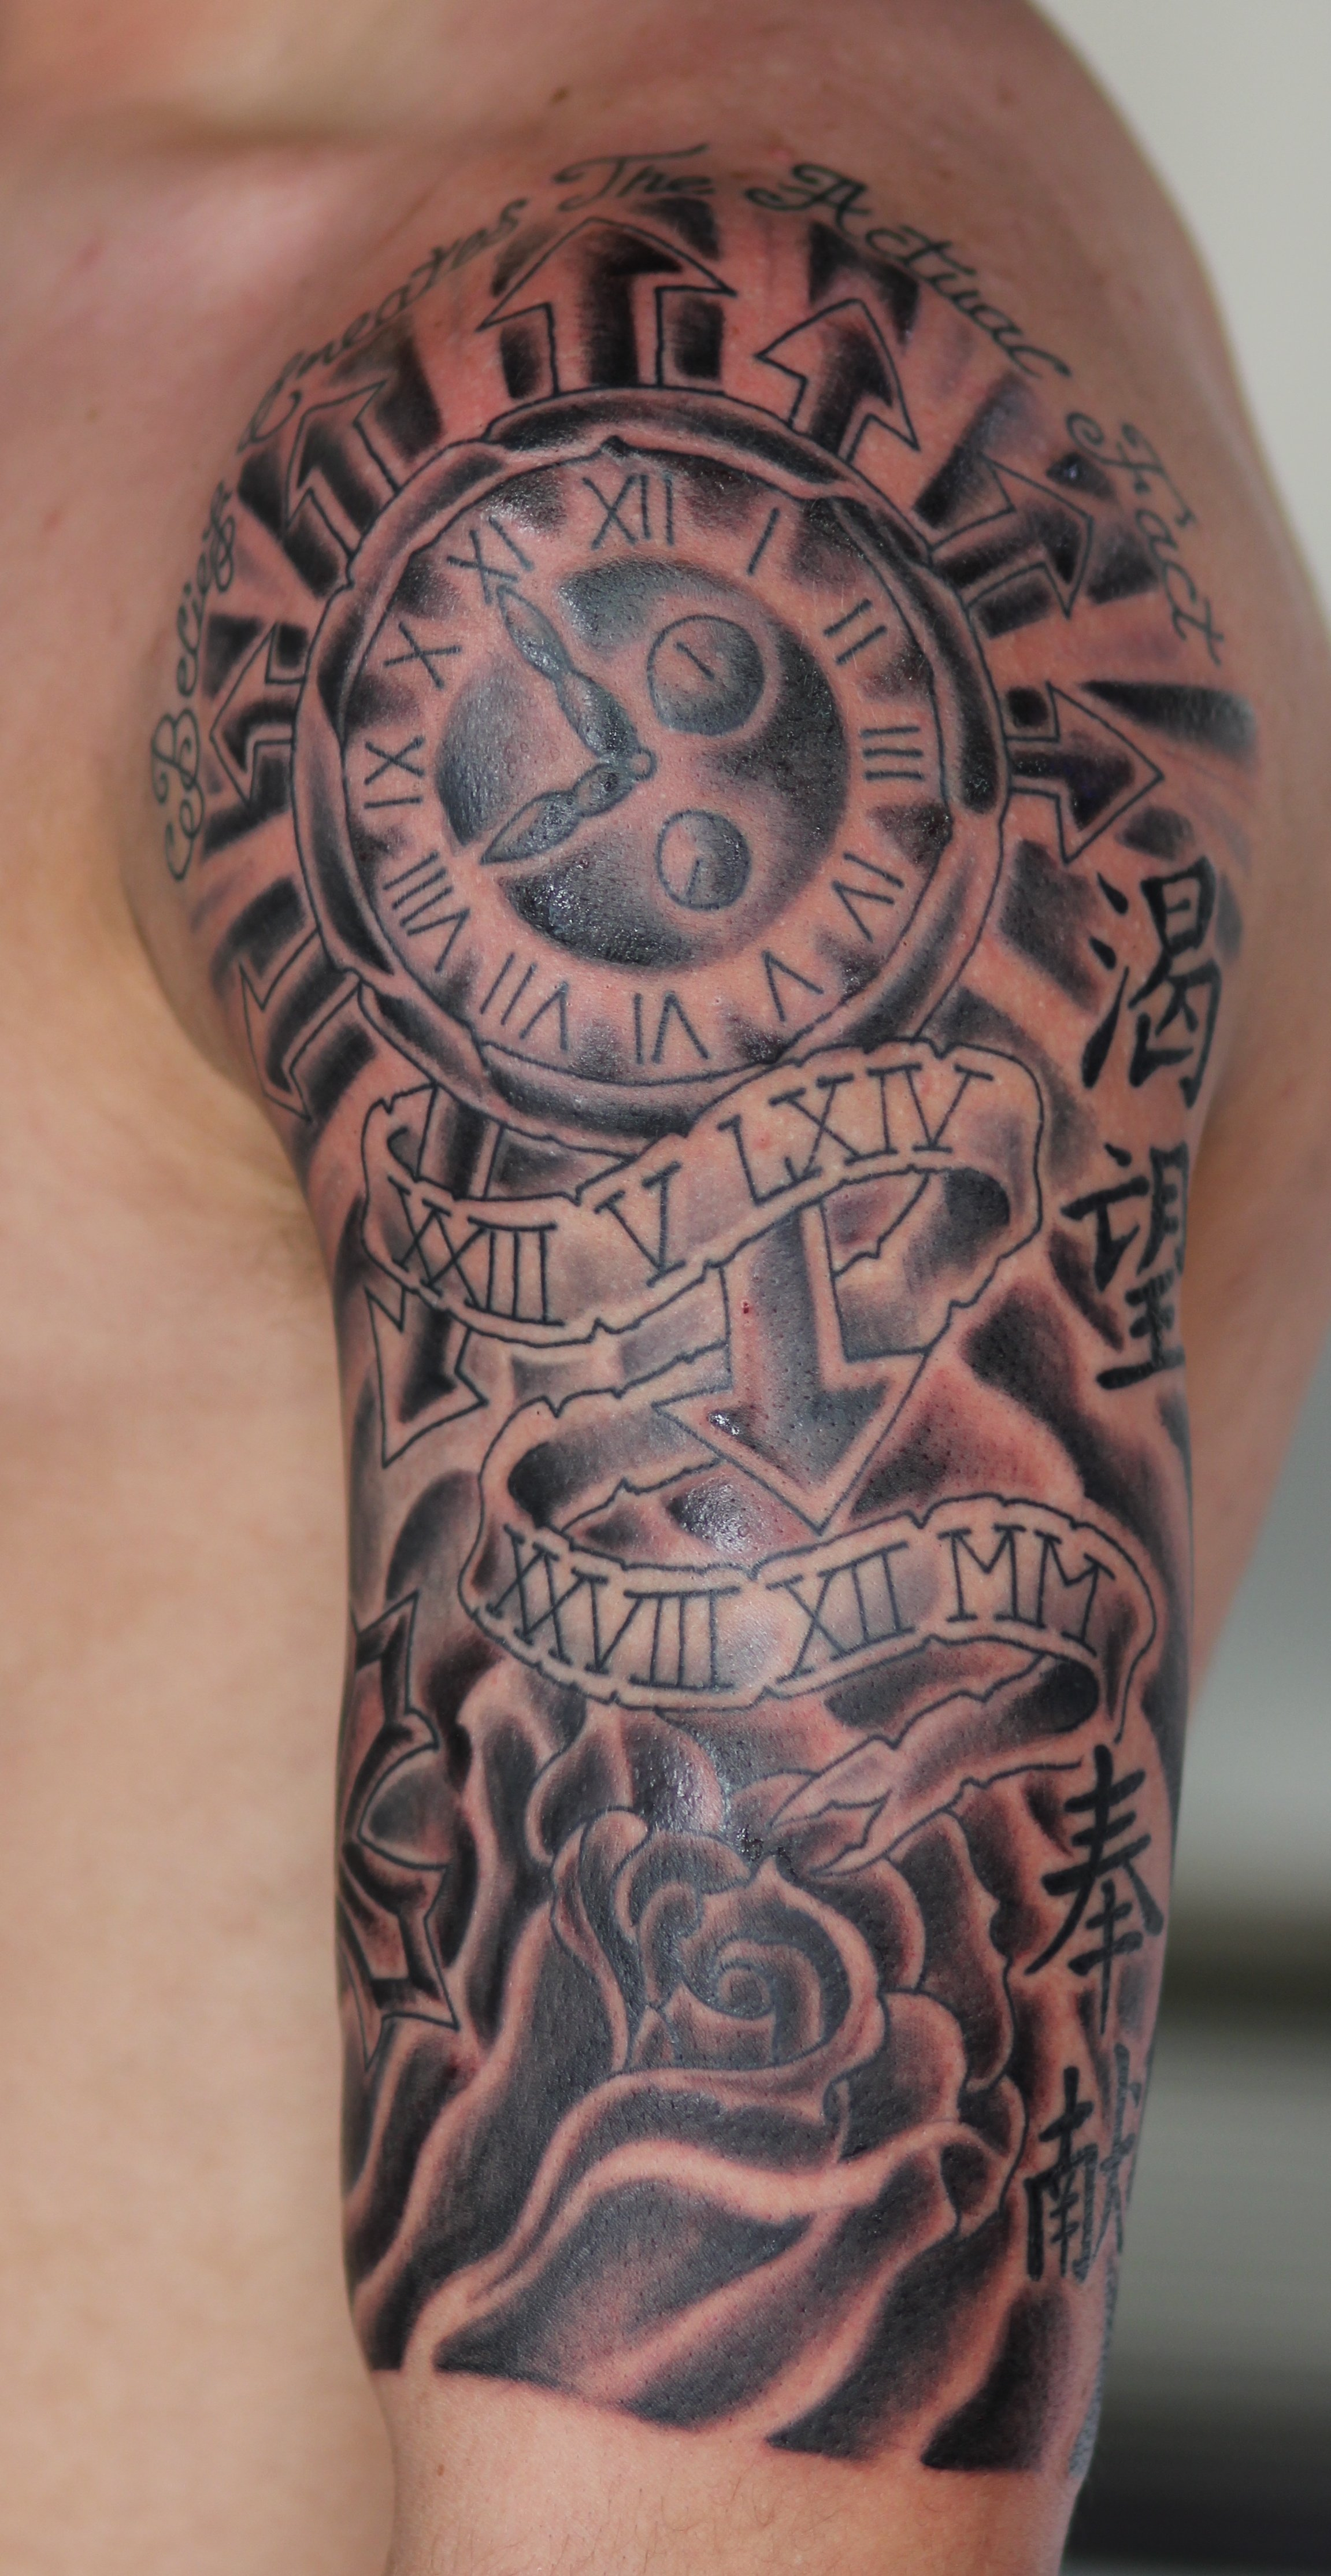 10 Stunning Ideas For Half Sleeve Tattoos half sleeve tattoos designs tattoo ideas pictures tattoo ideas 2 2020